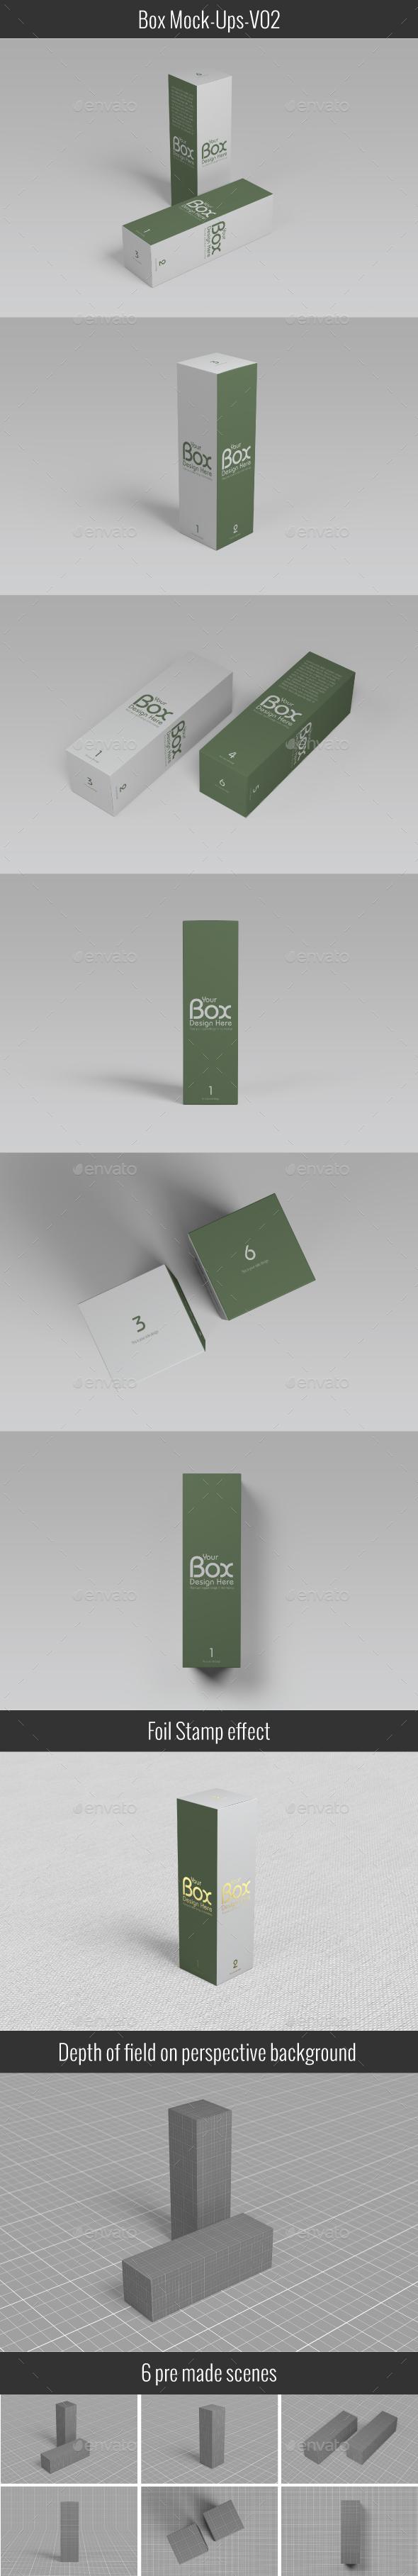 Package Box Mockups V-02 - Packaging Product Mock-Ups